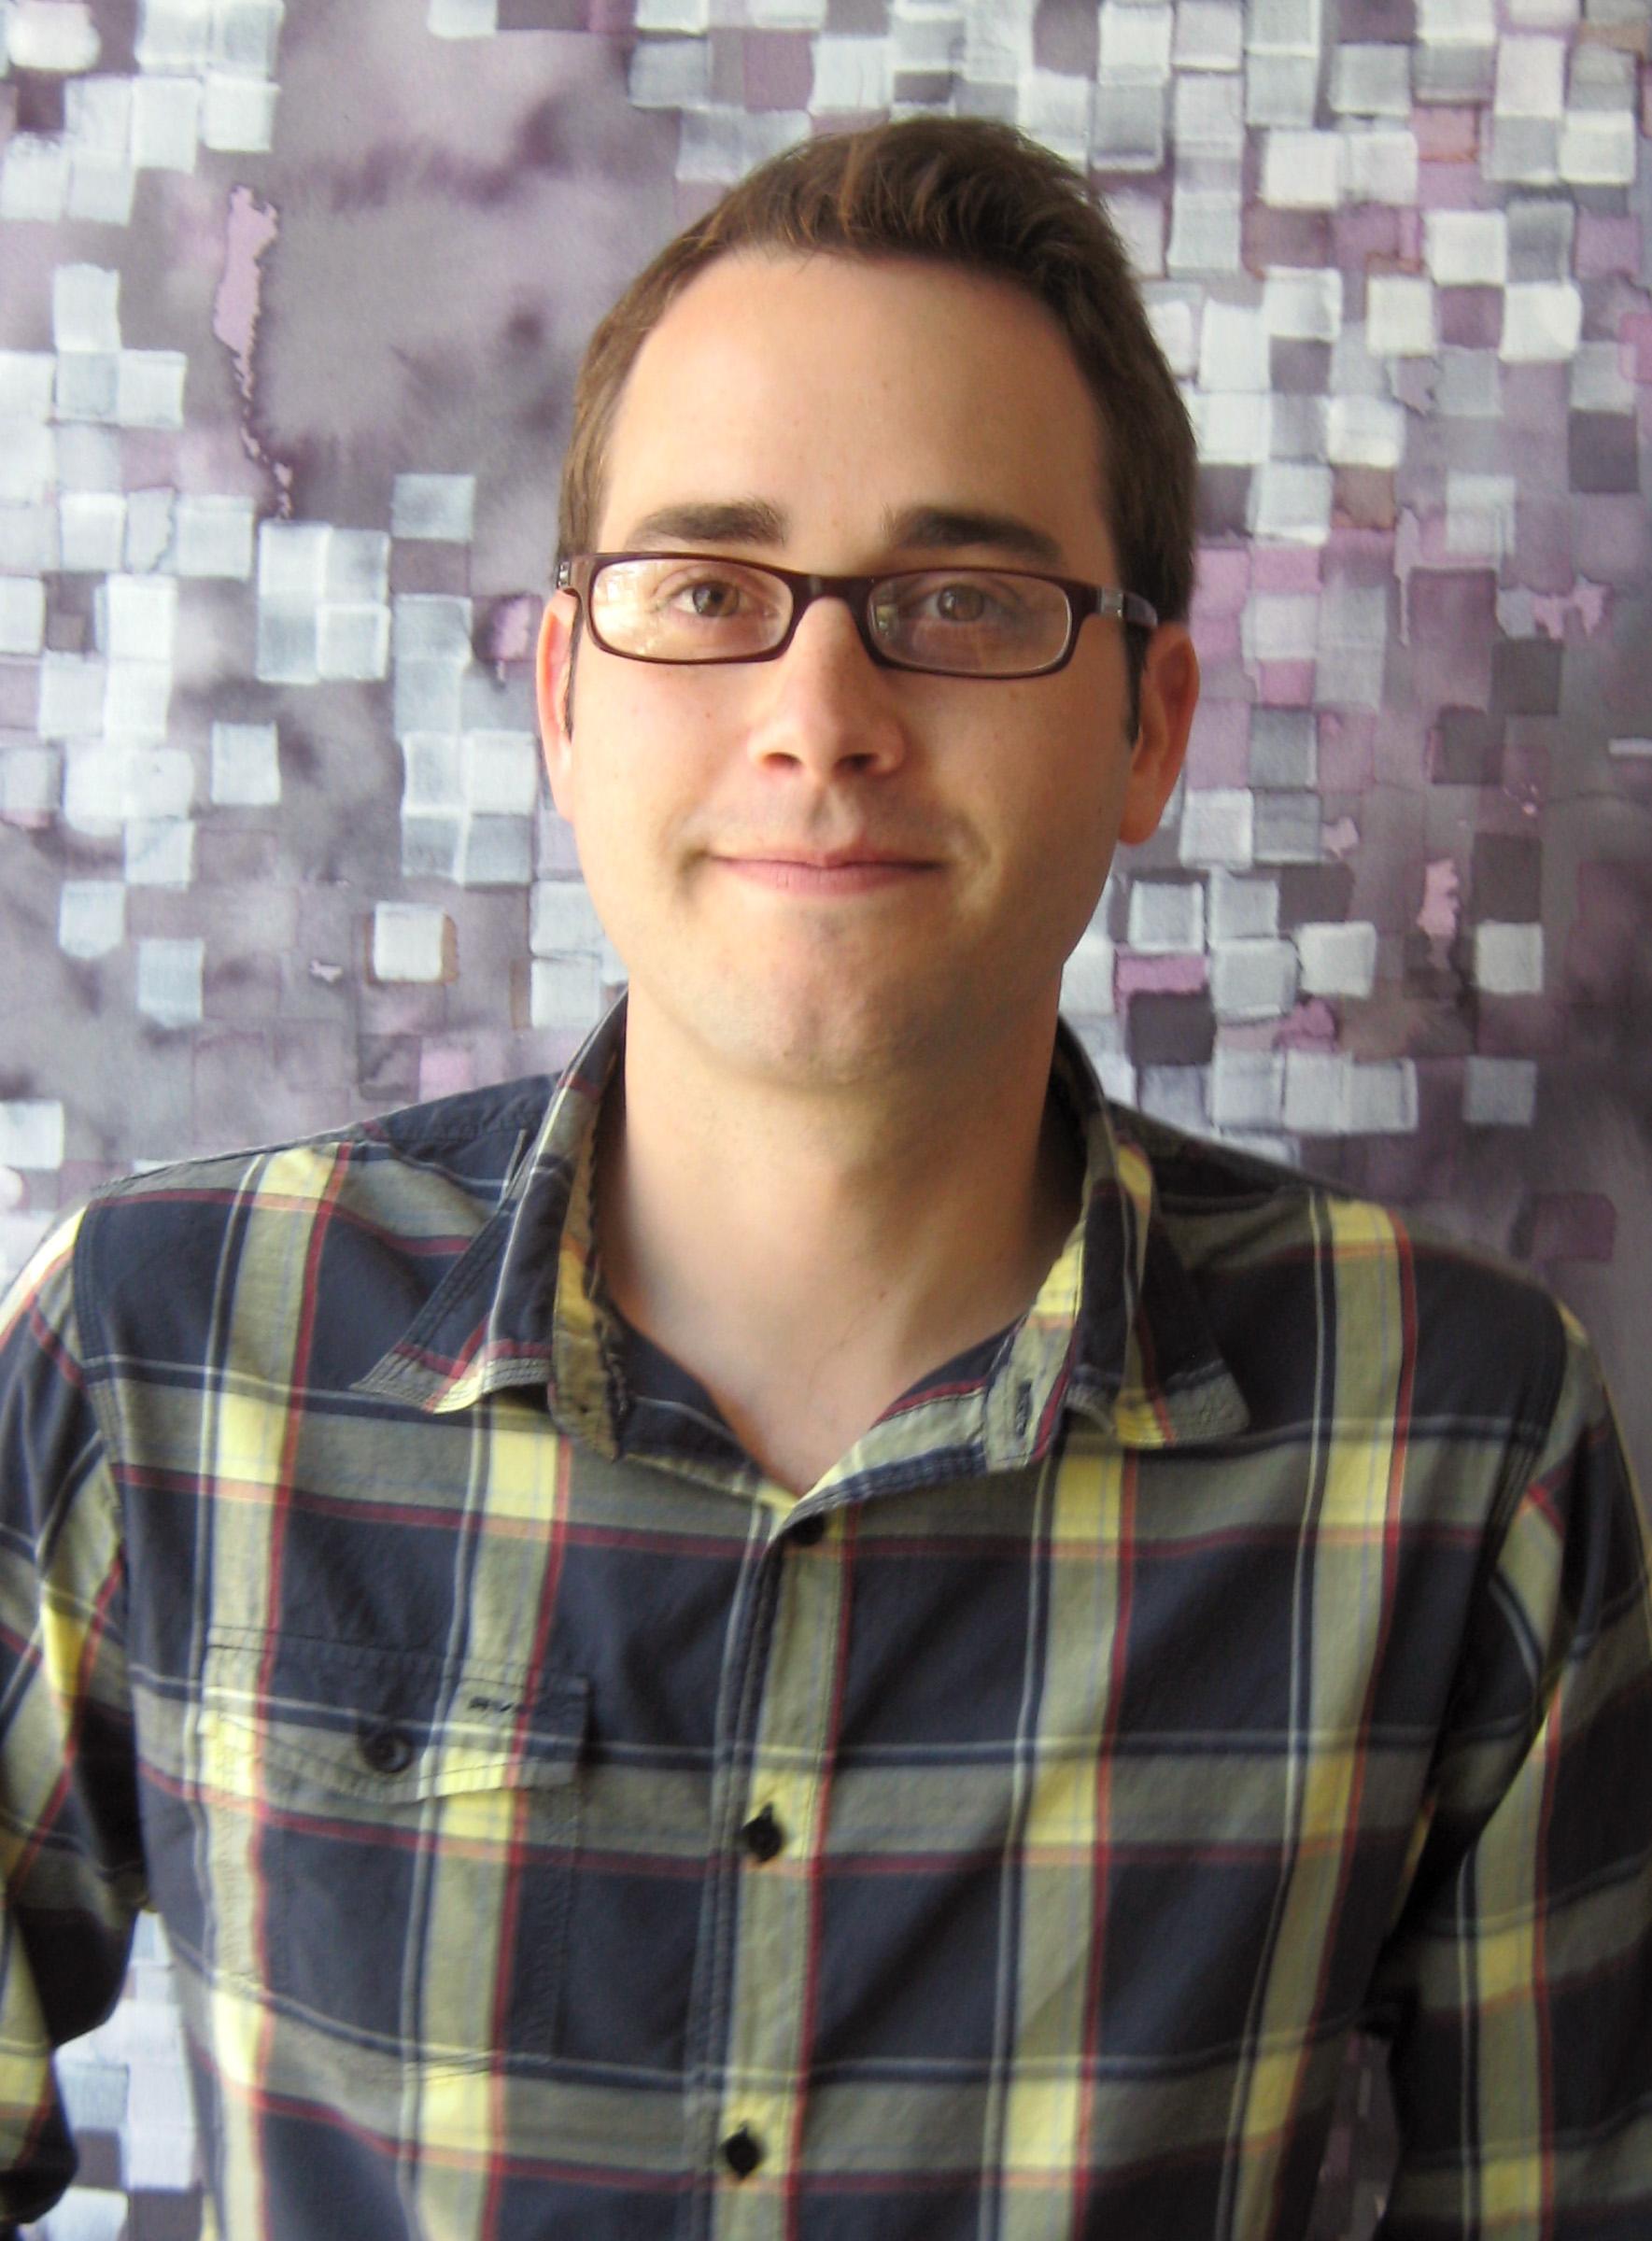 Mike Vukadinovich vai reescrever Beetlejuice 2